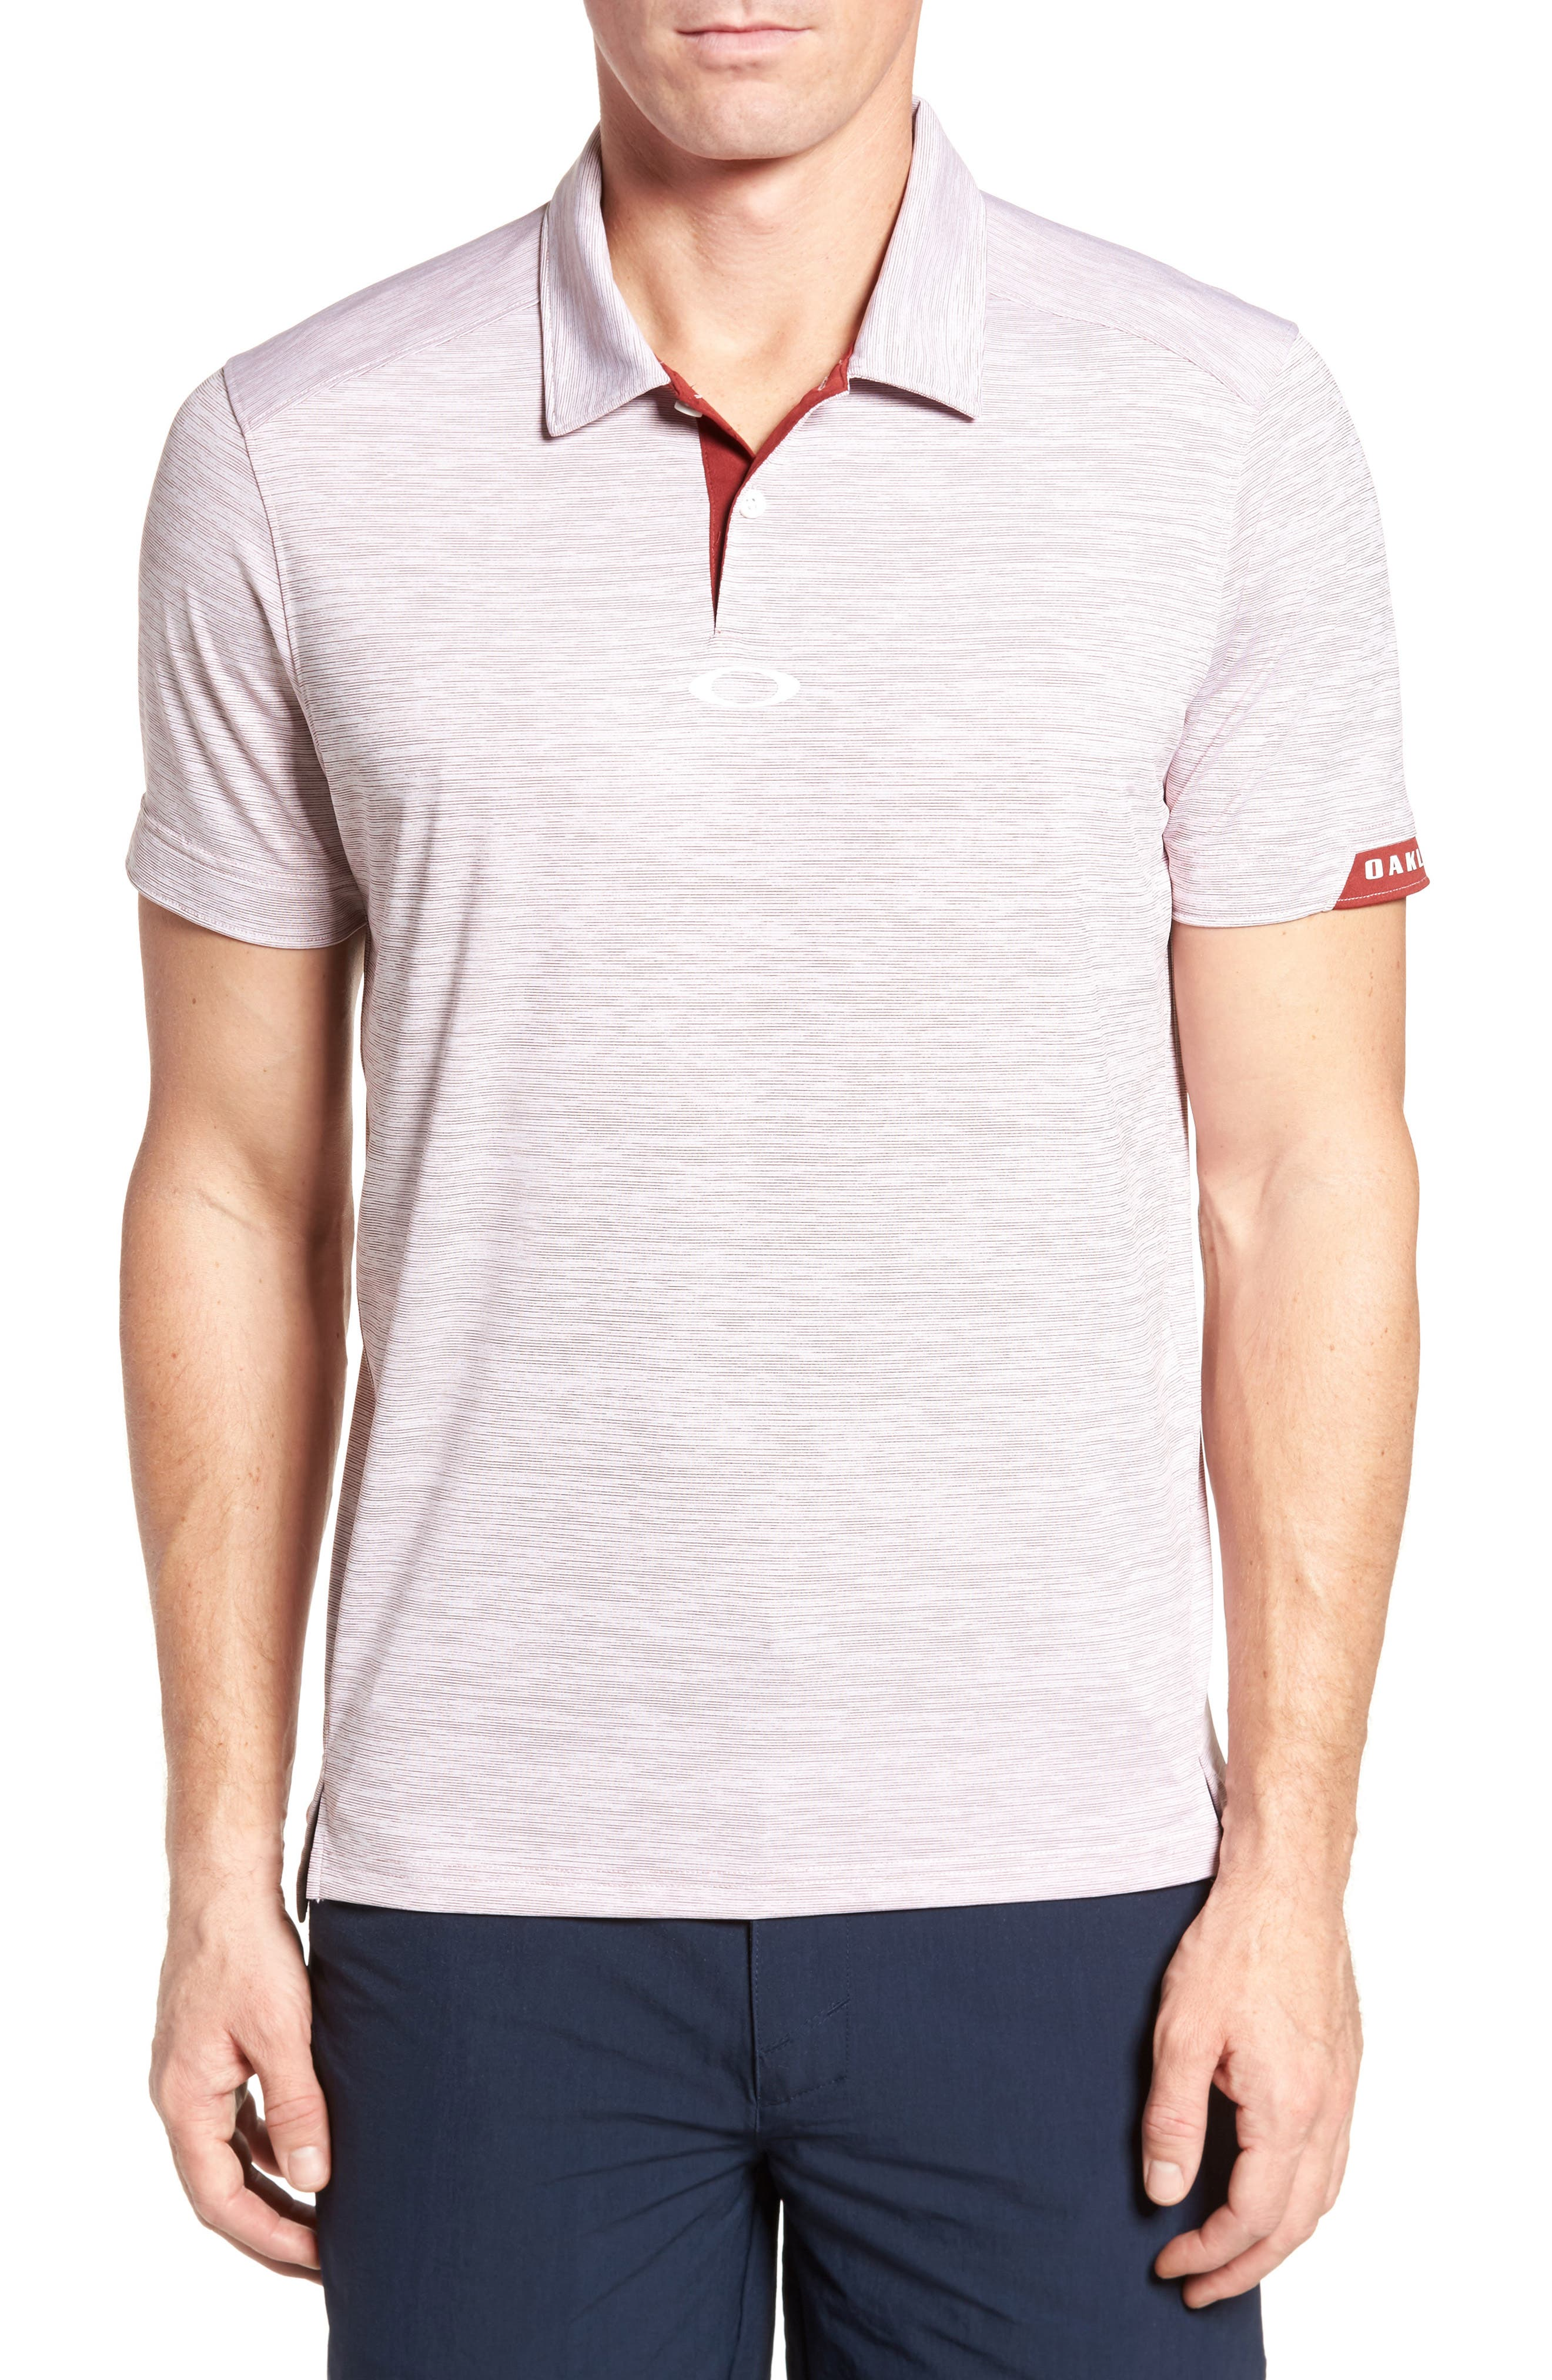 Main Image - Oakley Gravity Polo Shirt